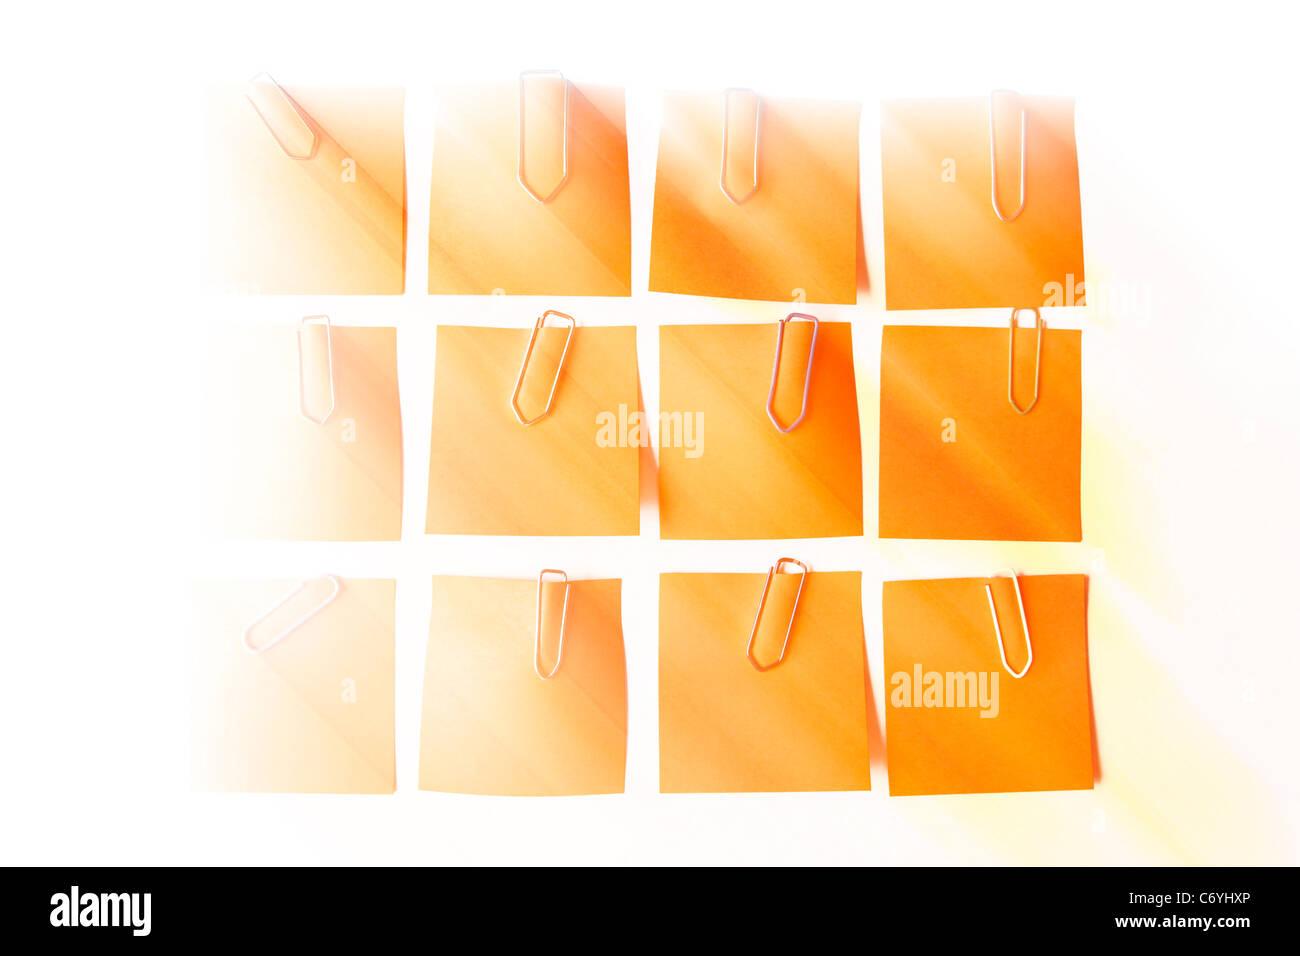 digital enhancement - arrangement of memorandum memory post-it with paper clips - Stock Image